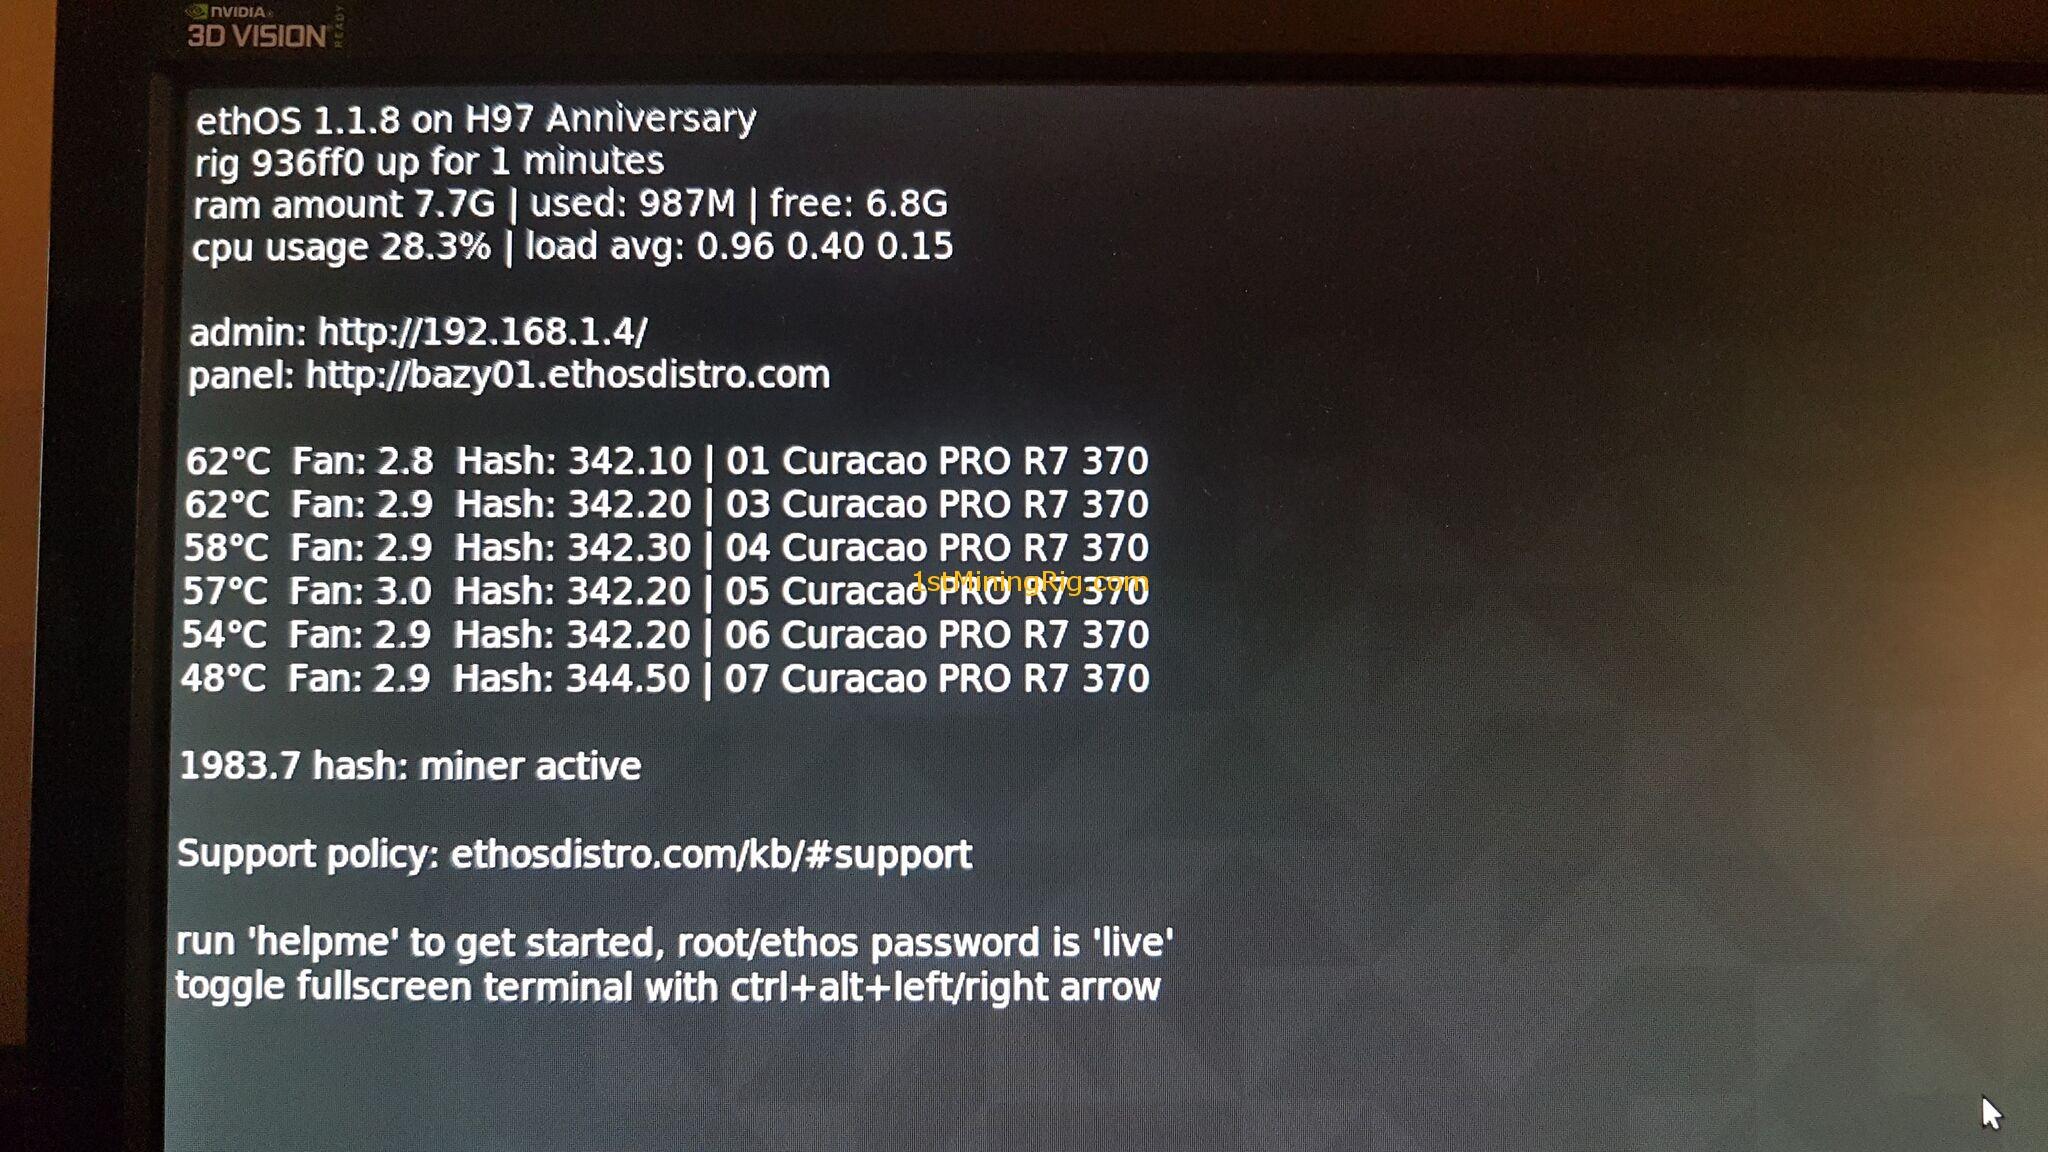 Radeon R7 240 Mining Gpu Mining Rig Starter Kit With CpuMarina Service